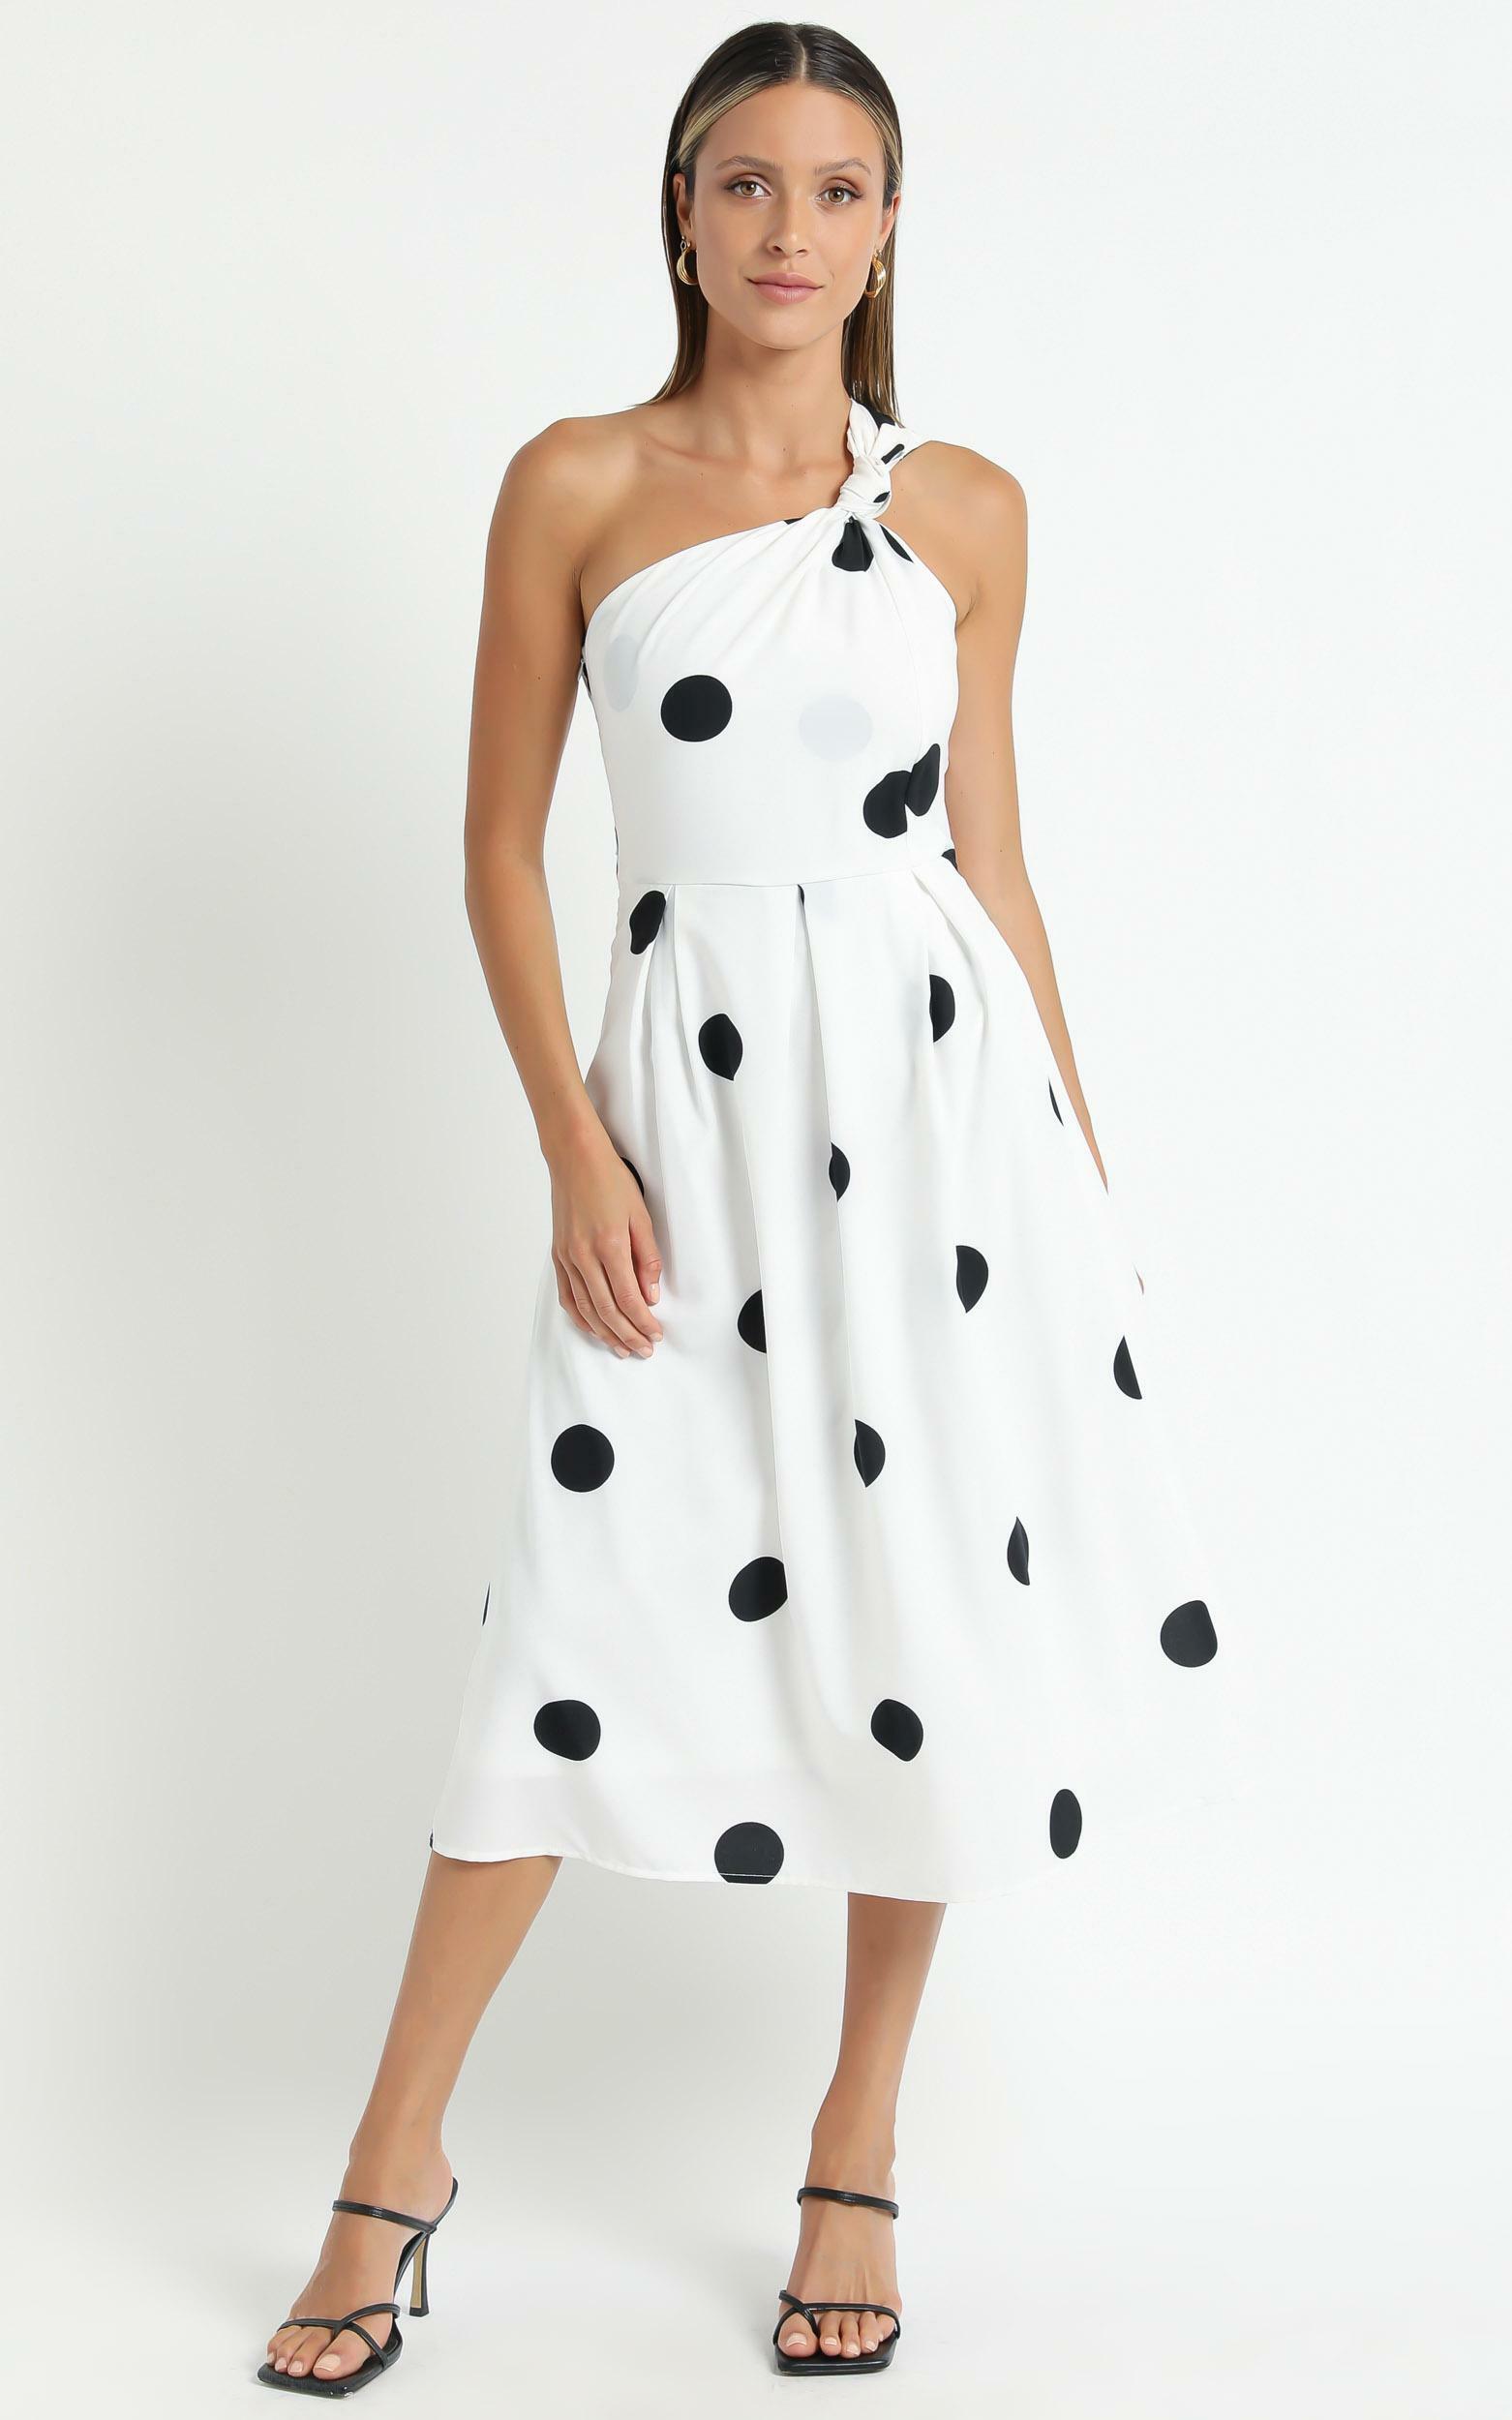 Lakeyn Dress in White Polka - 06, WHT1, hi-res image number null